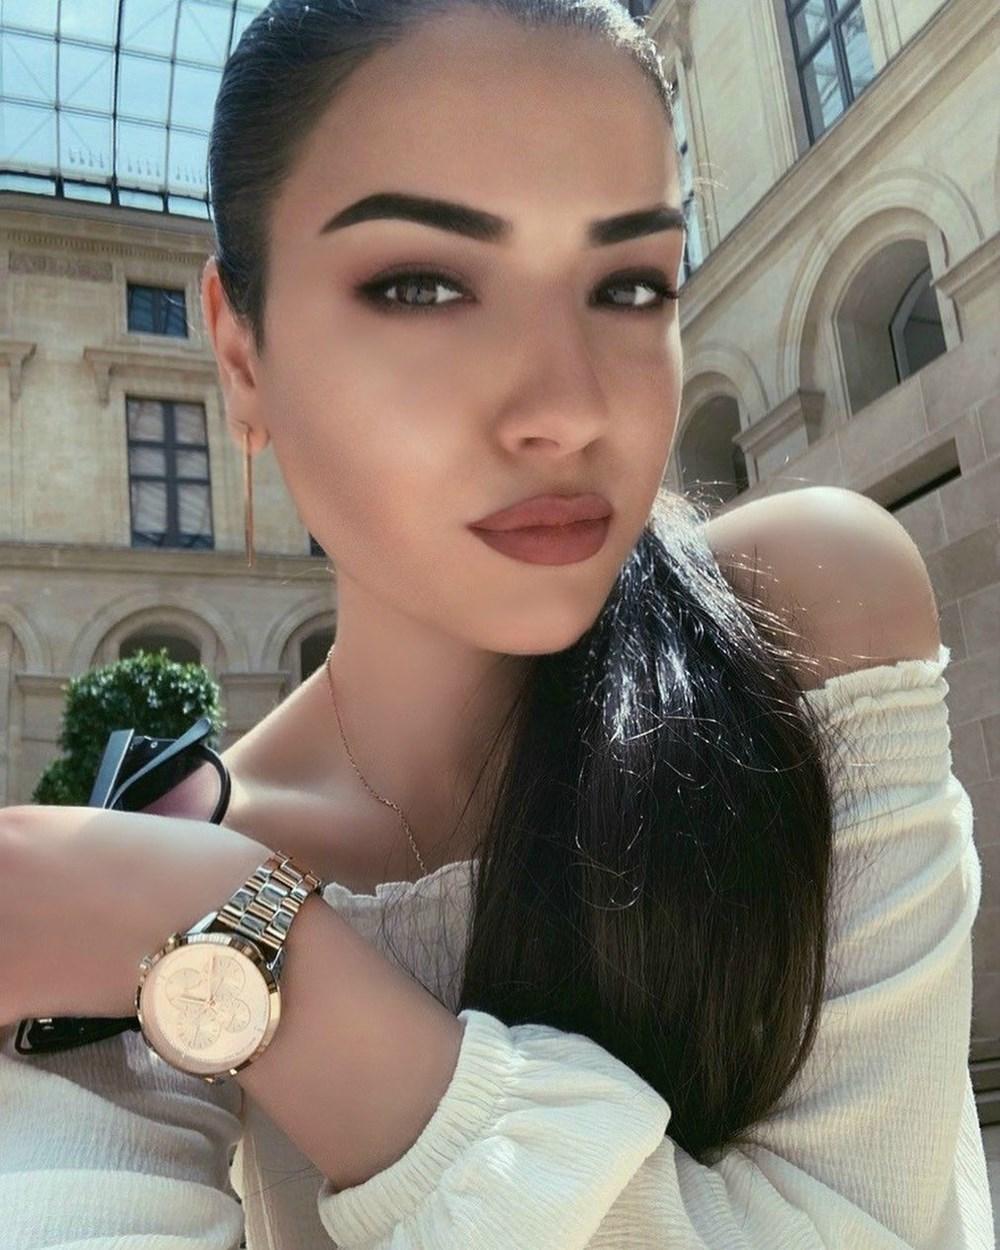 Fenomen Anna Leikovic annesini öldürdü - 6